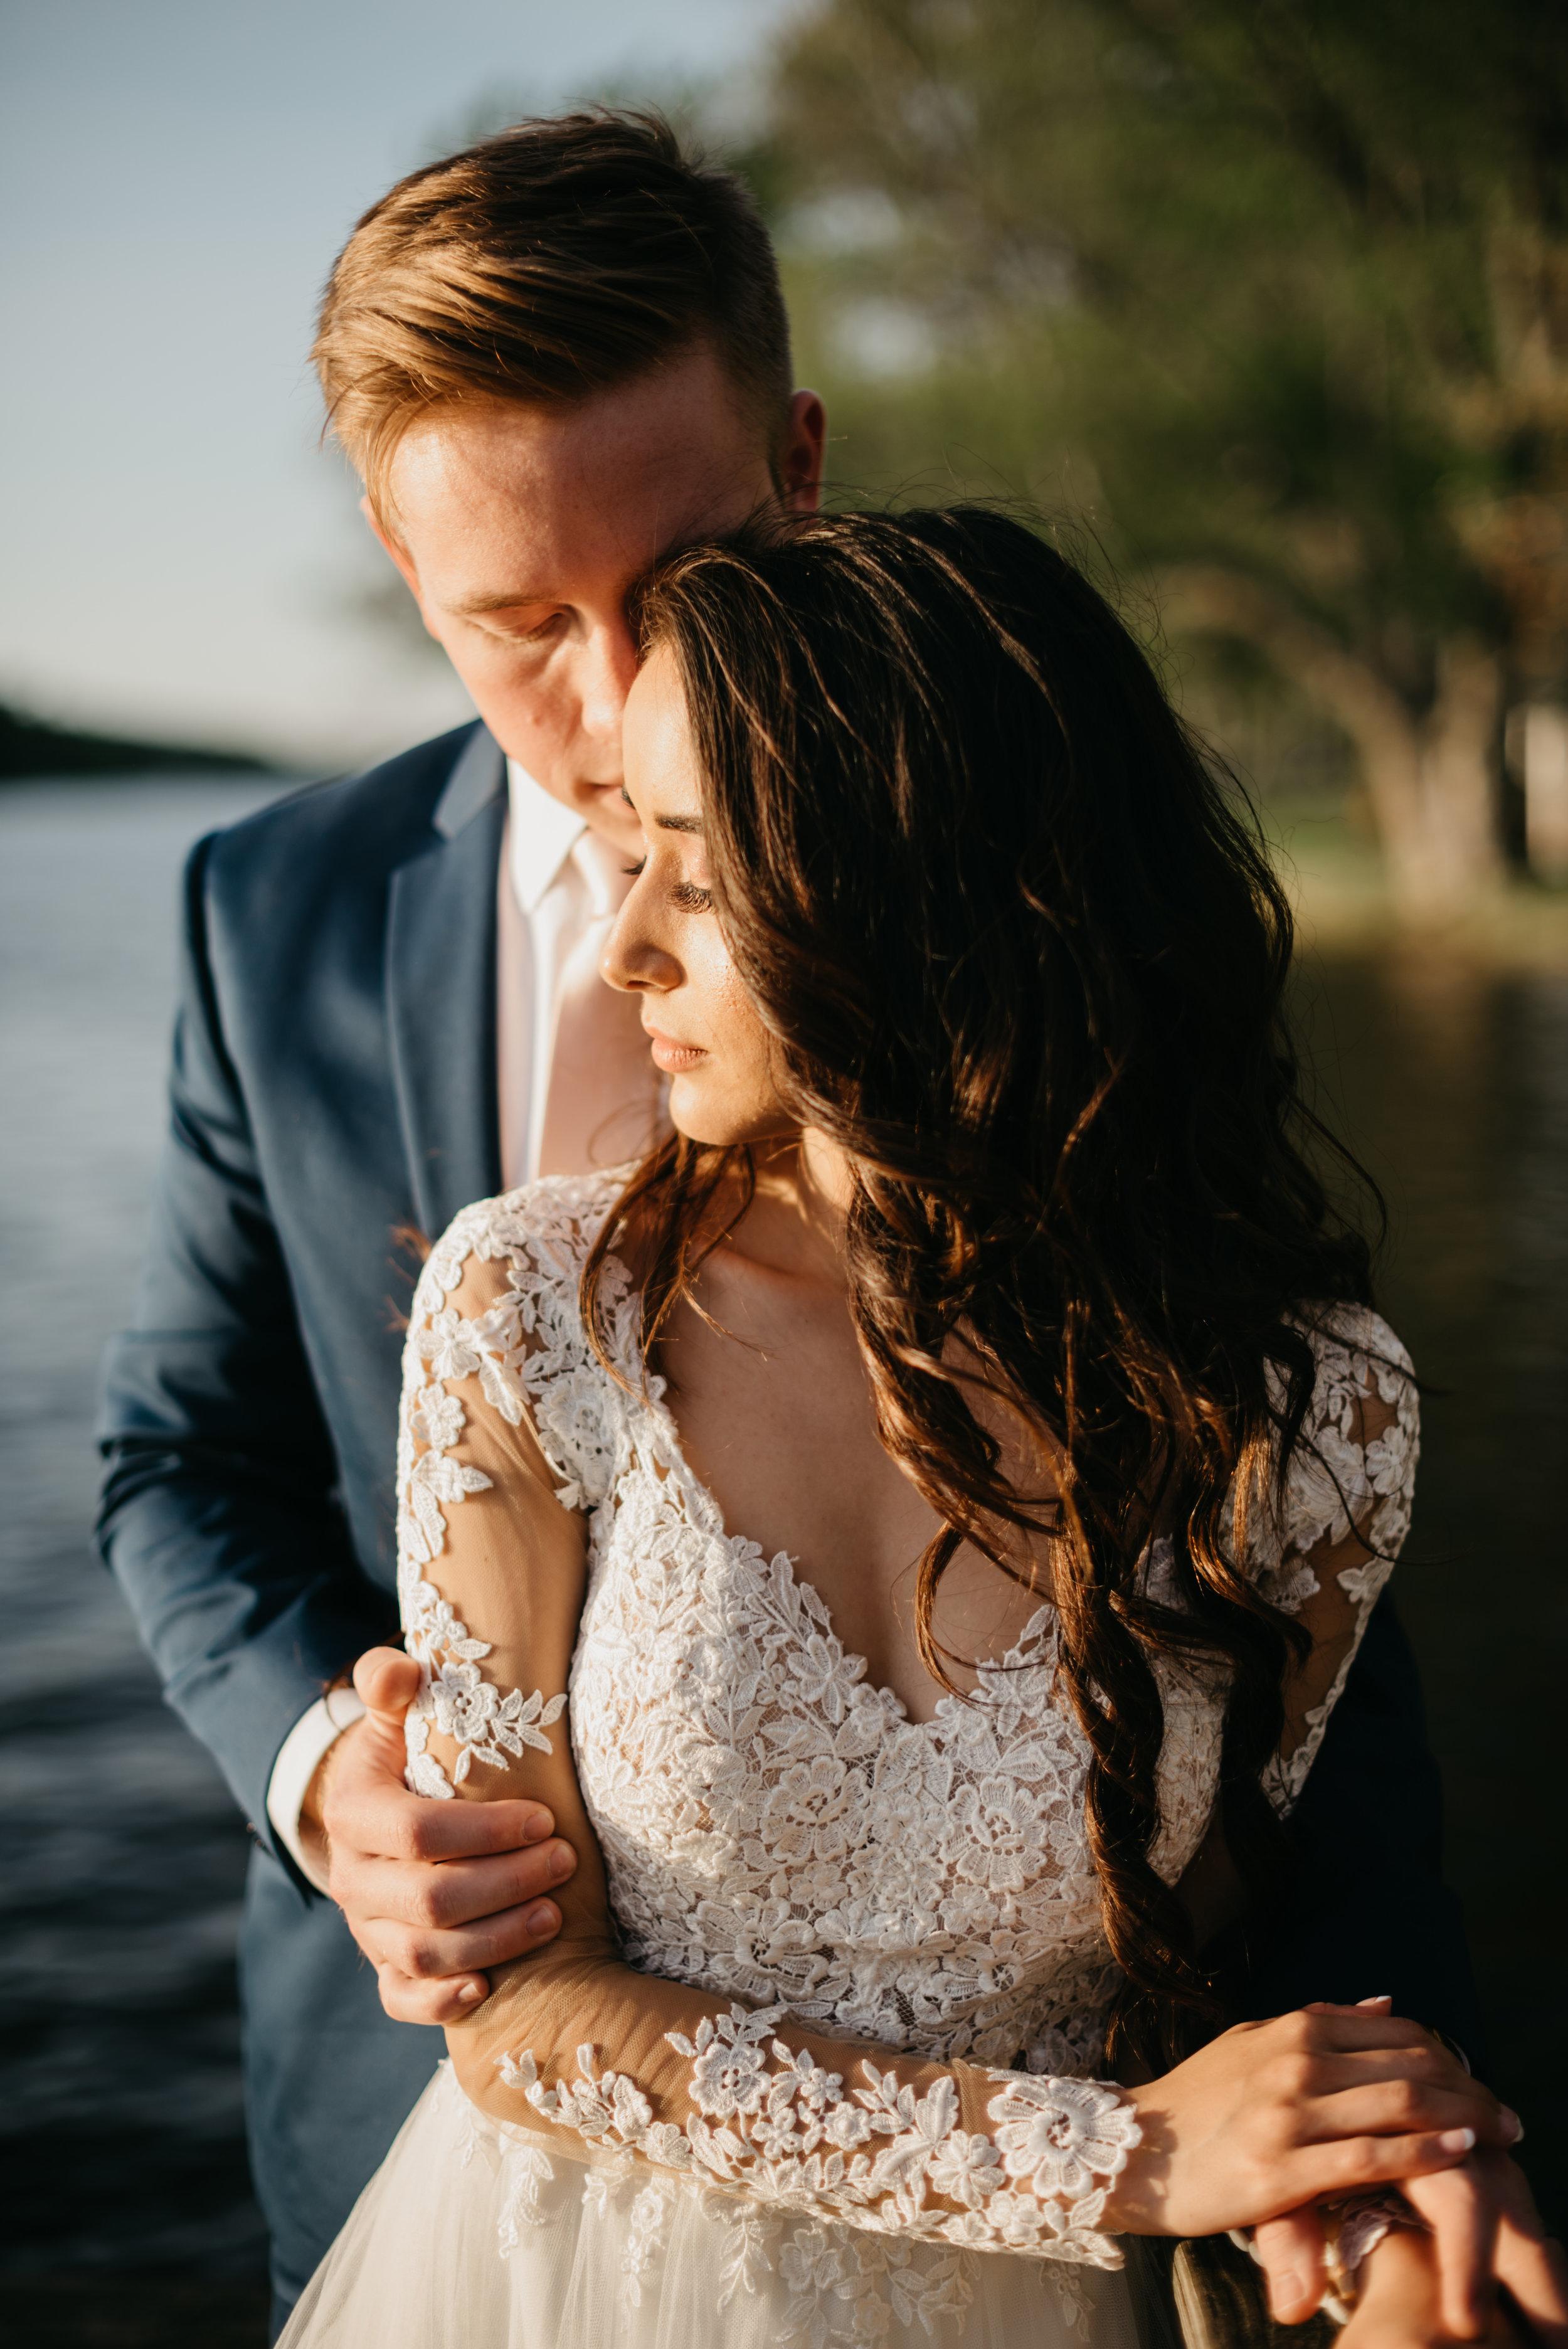 Barch-Massachusetts-Lakeside Tent Wedding-Western Massachusetts Wedding Photographer-03077.jpg